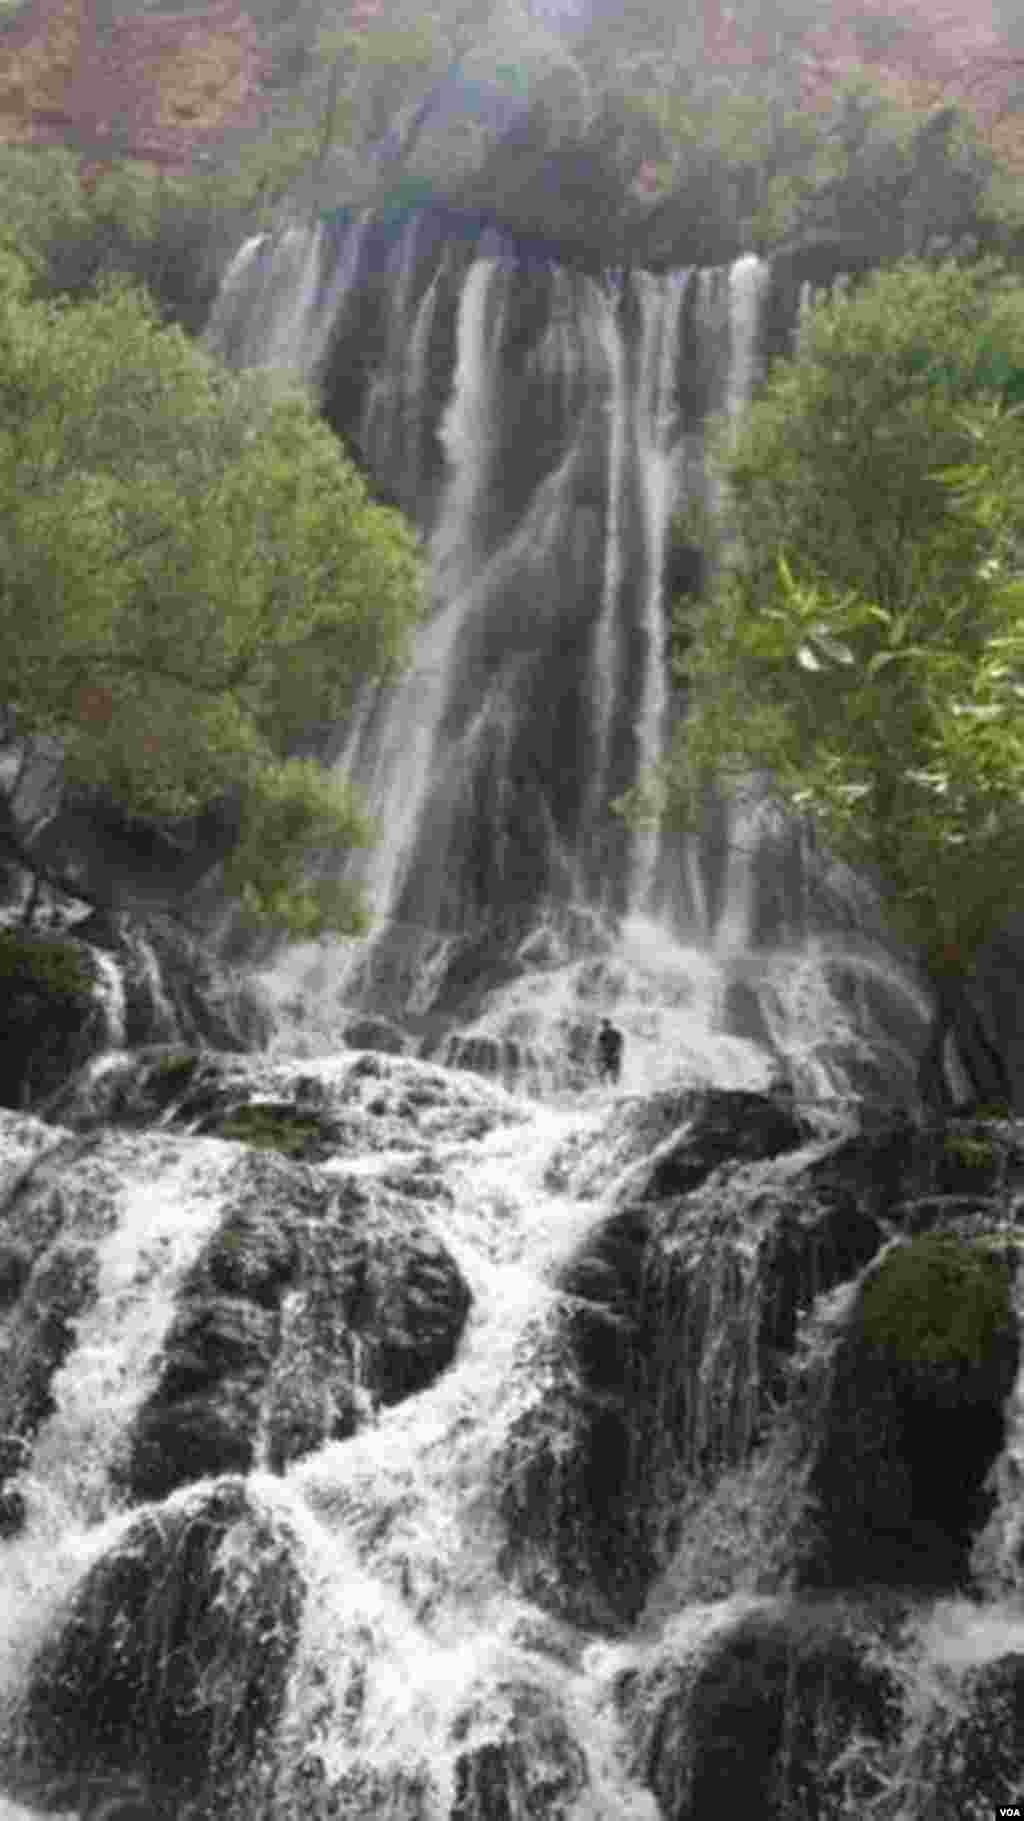 آبشار شوی- دزفول عکس: محمد (ارسالی شما)